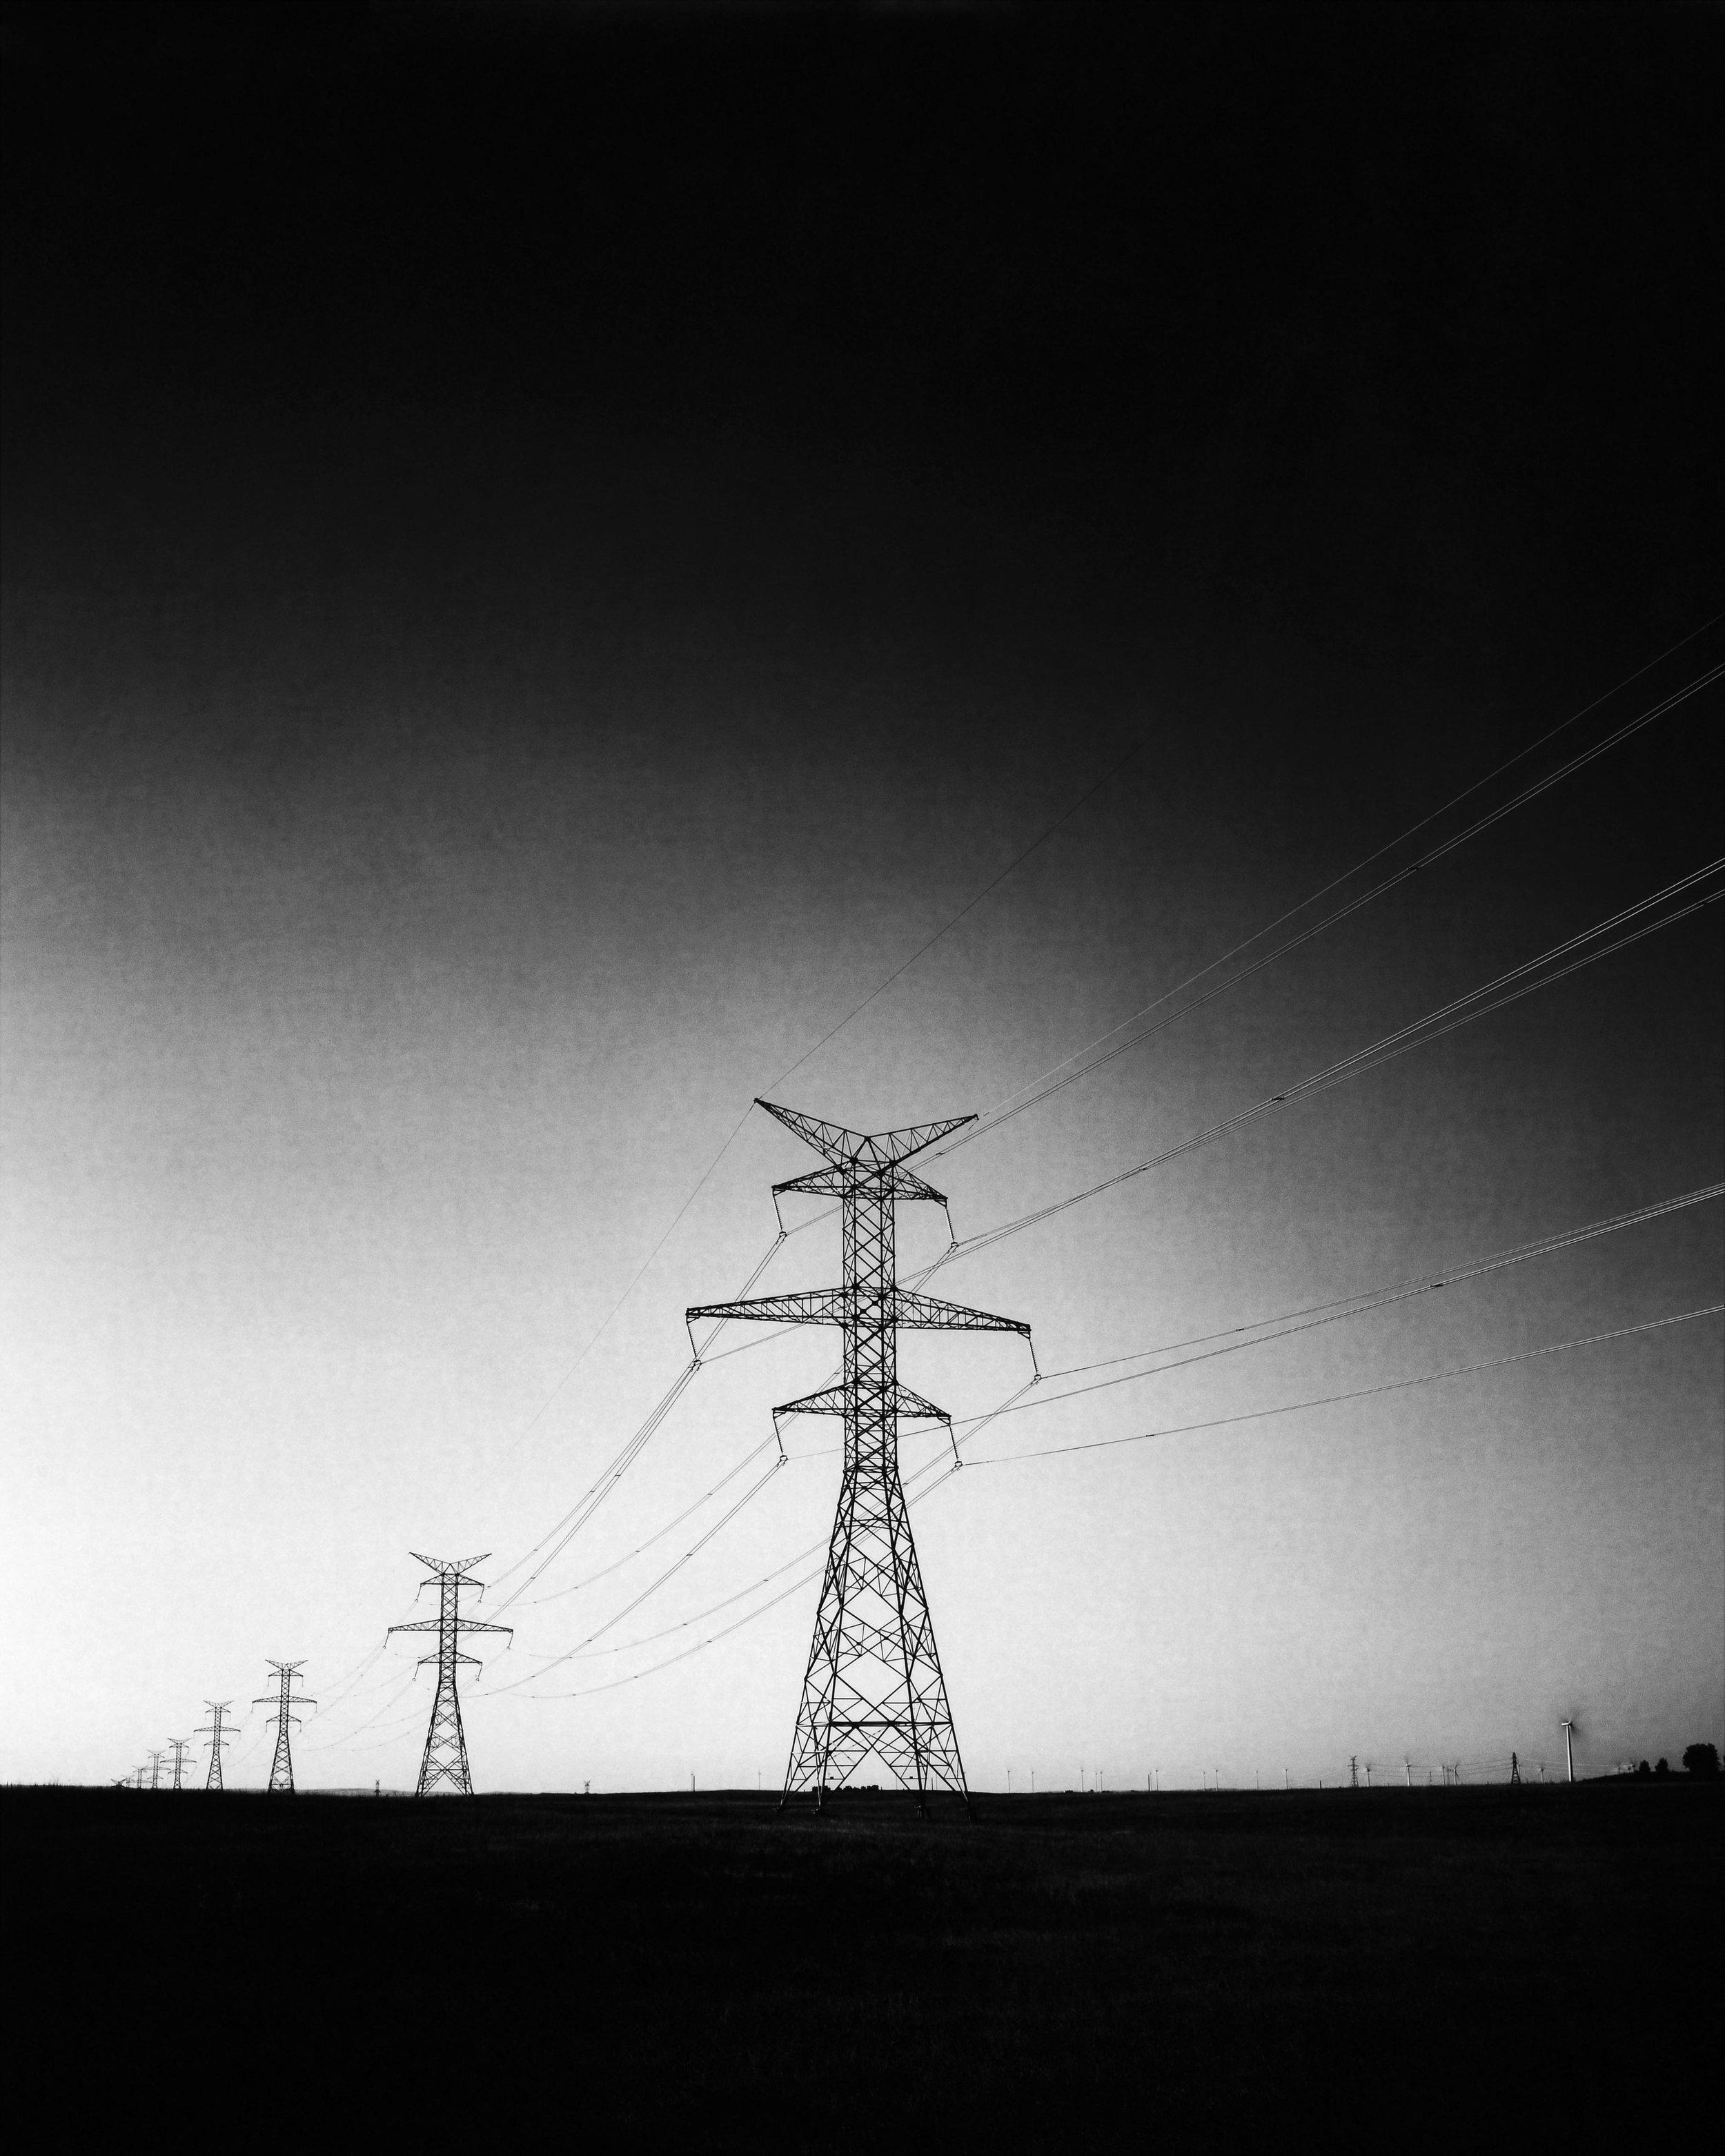 Reproduction - Powerlines - Print - No Border.jpg